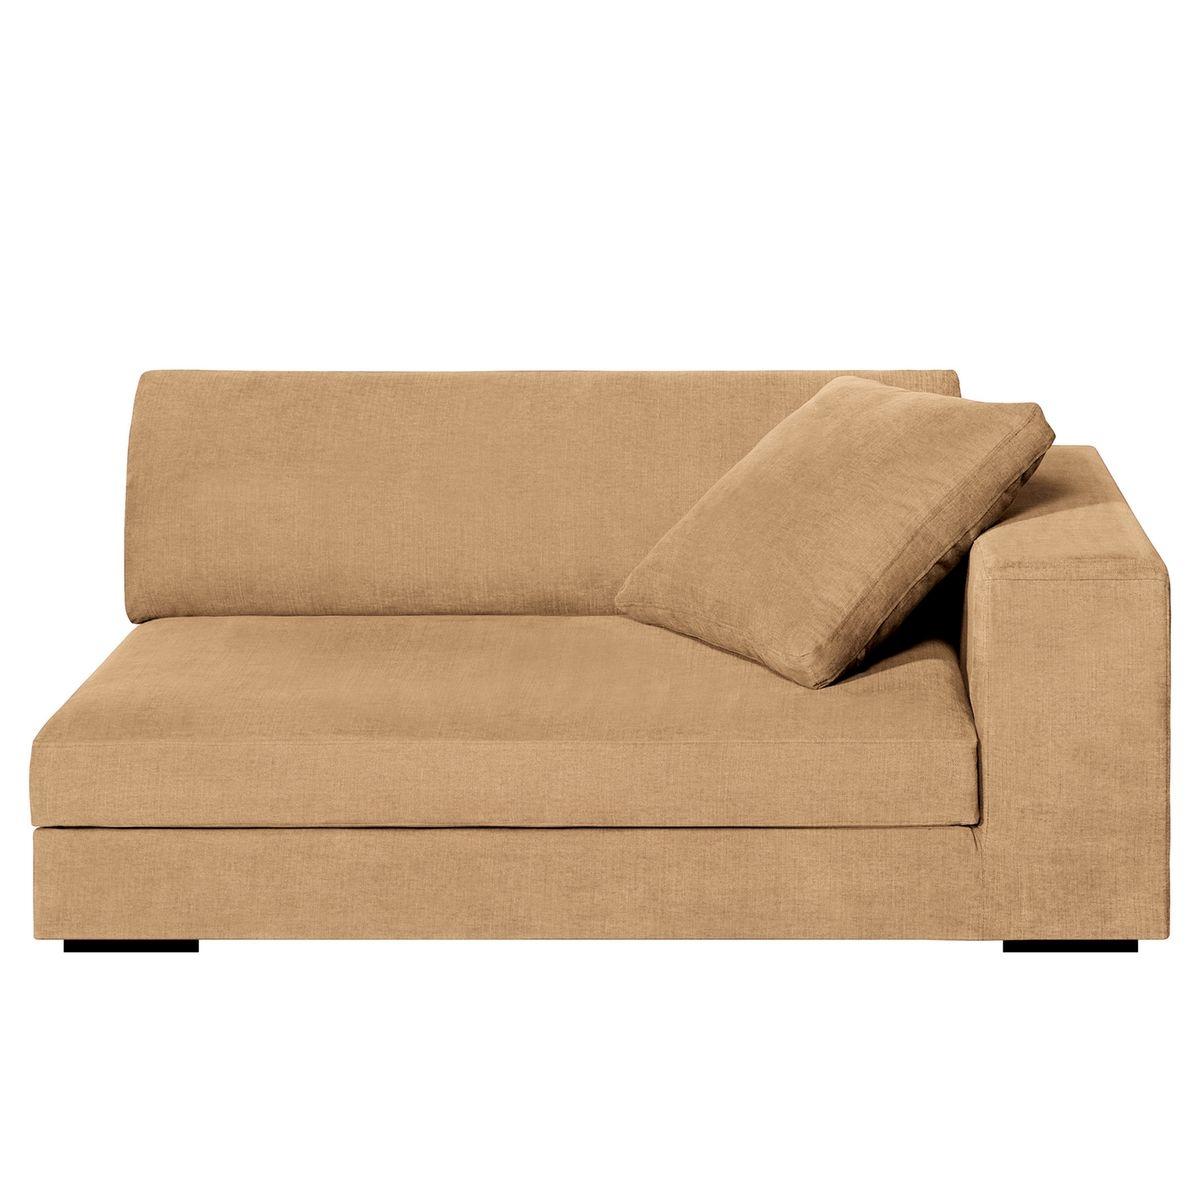 matelas ressort ou latex. Black Bedroom Furniture Sets. Home Design Ideas